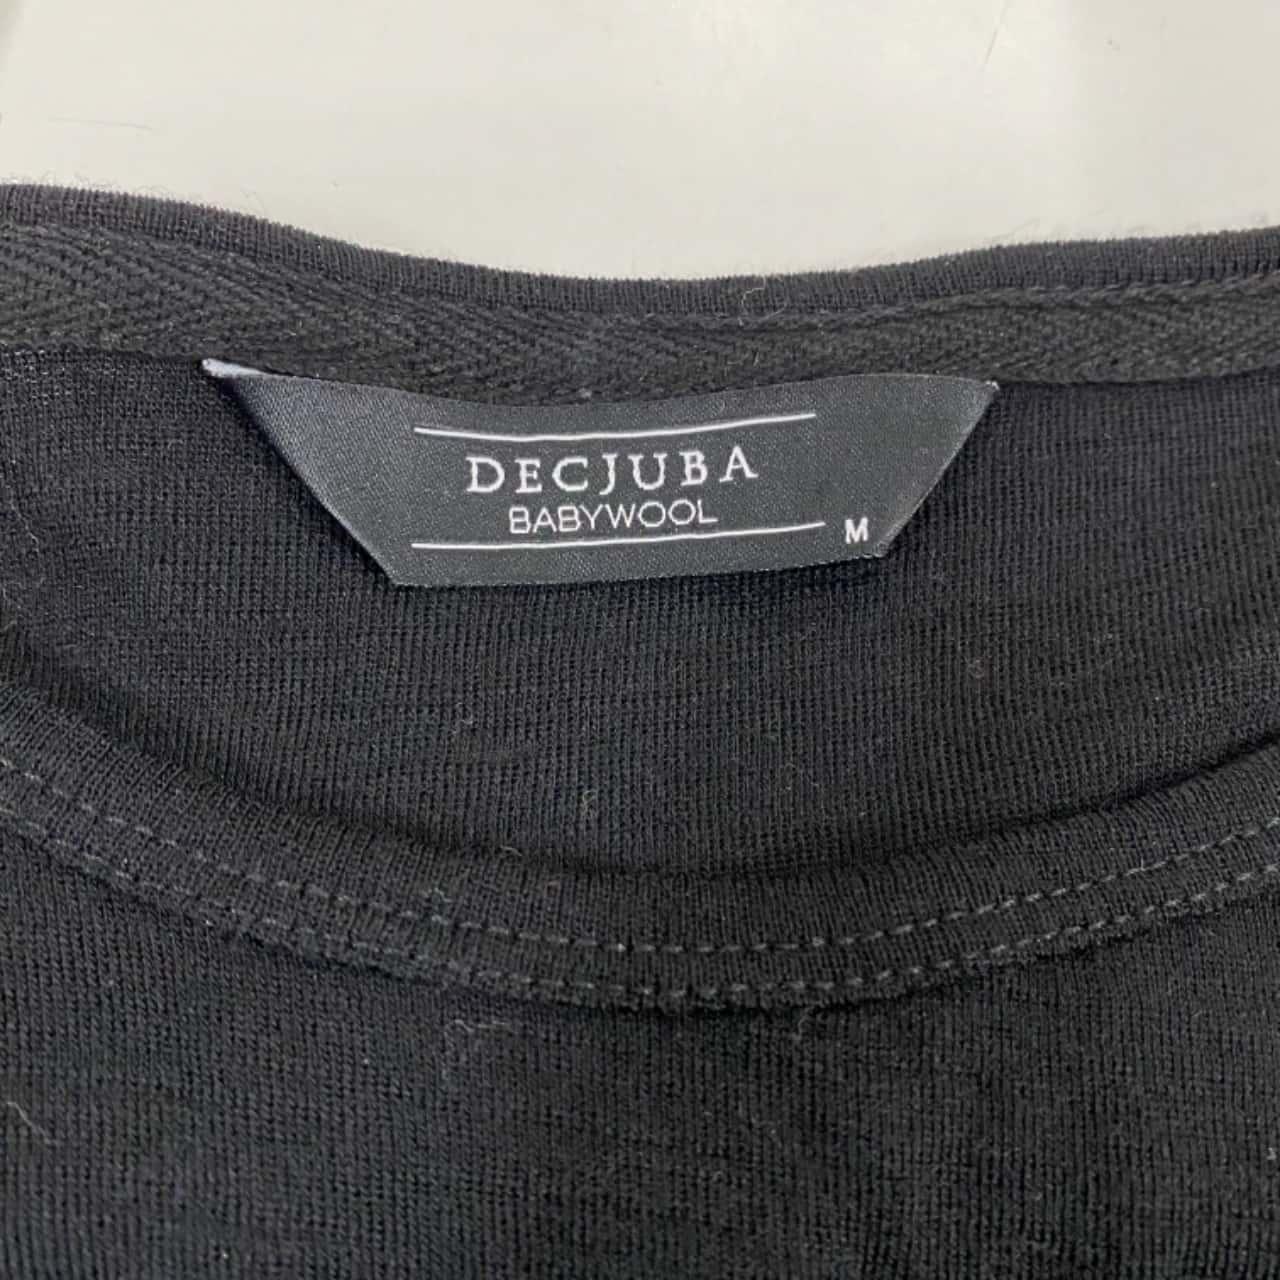 Decjuba Womens  Size M Long Sleeved Top  Black